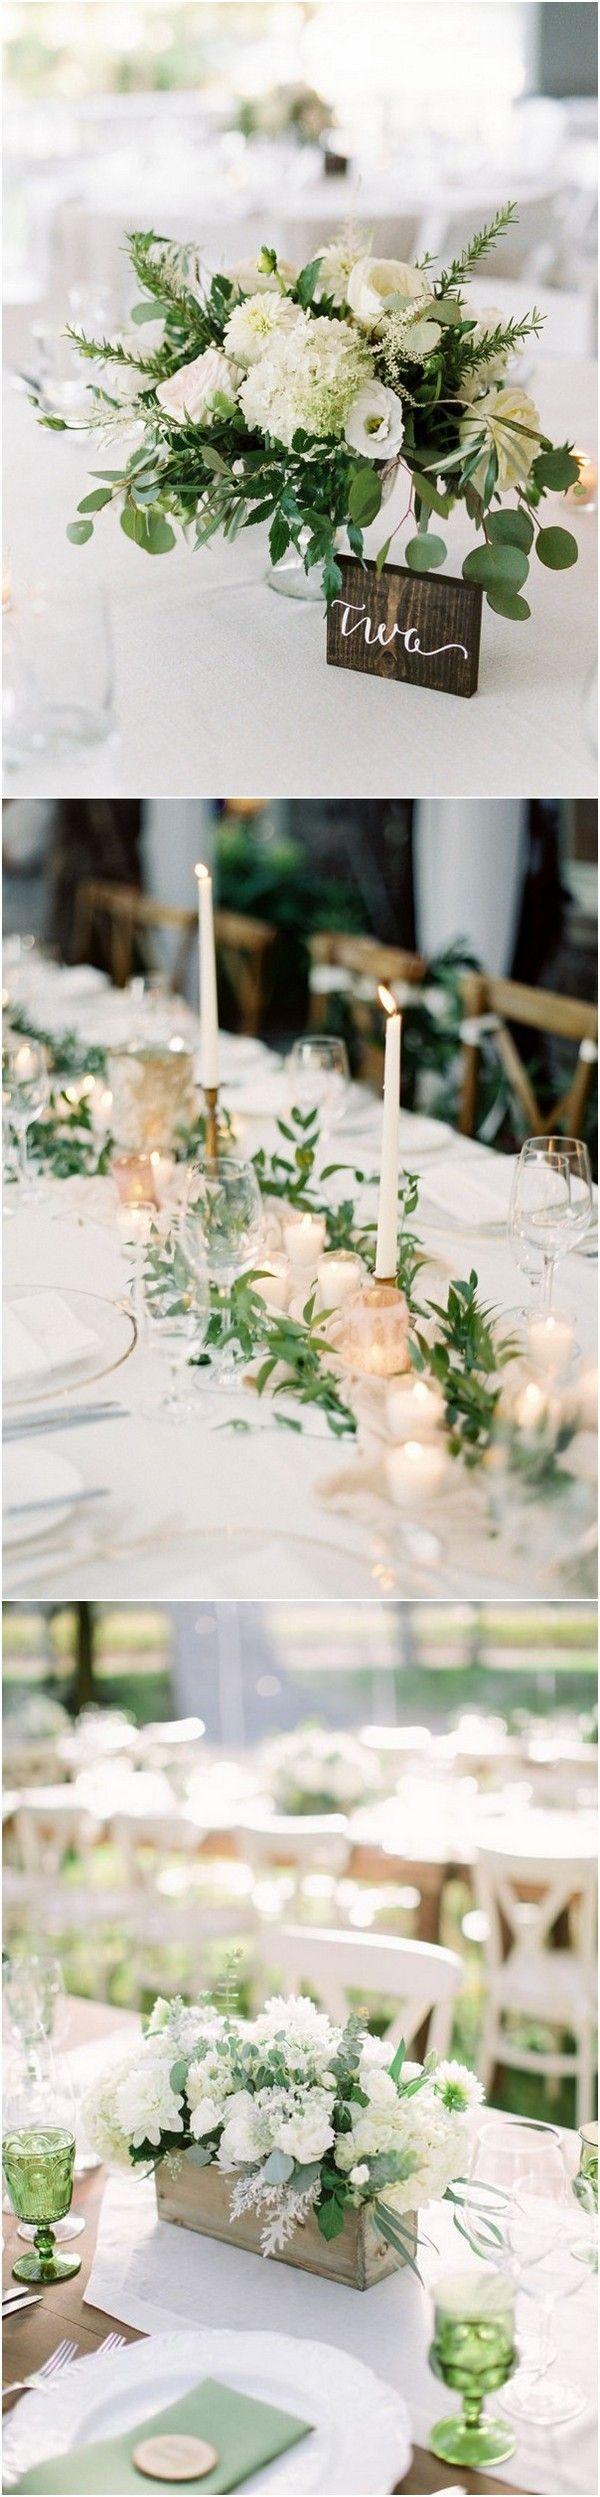 243 best Wedding Centerpieces images on Pinterest | Wedding ideas ...